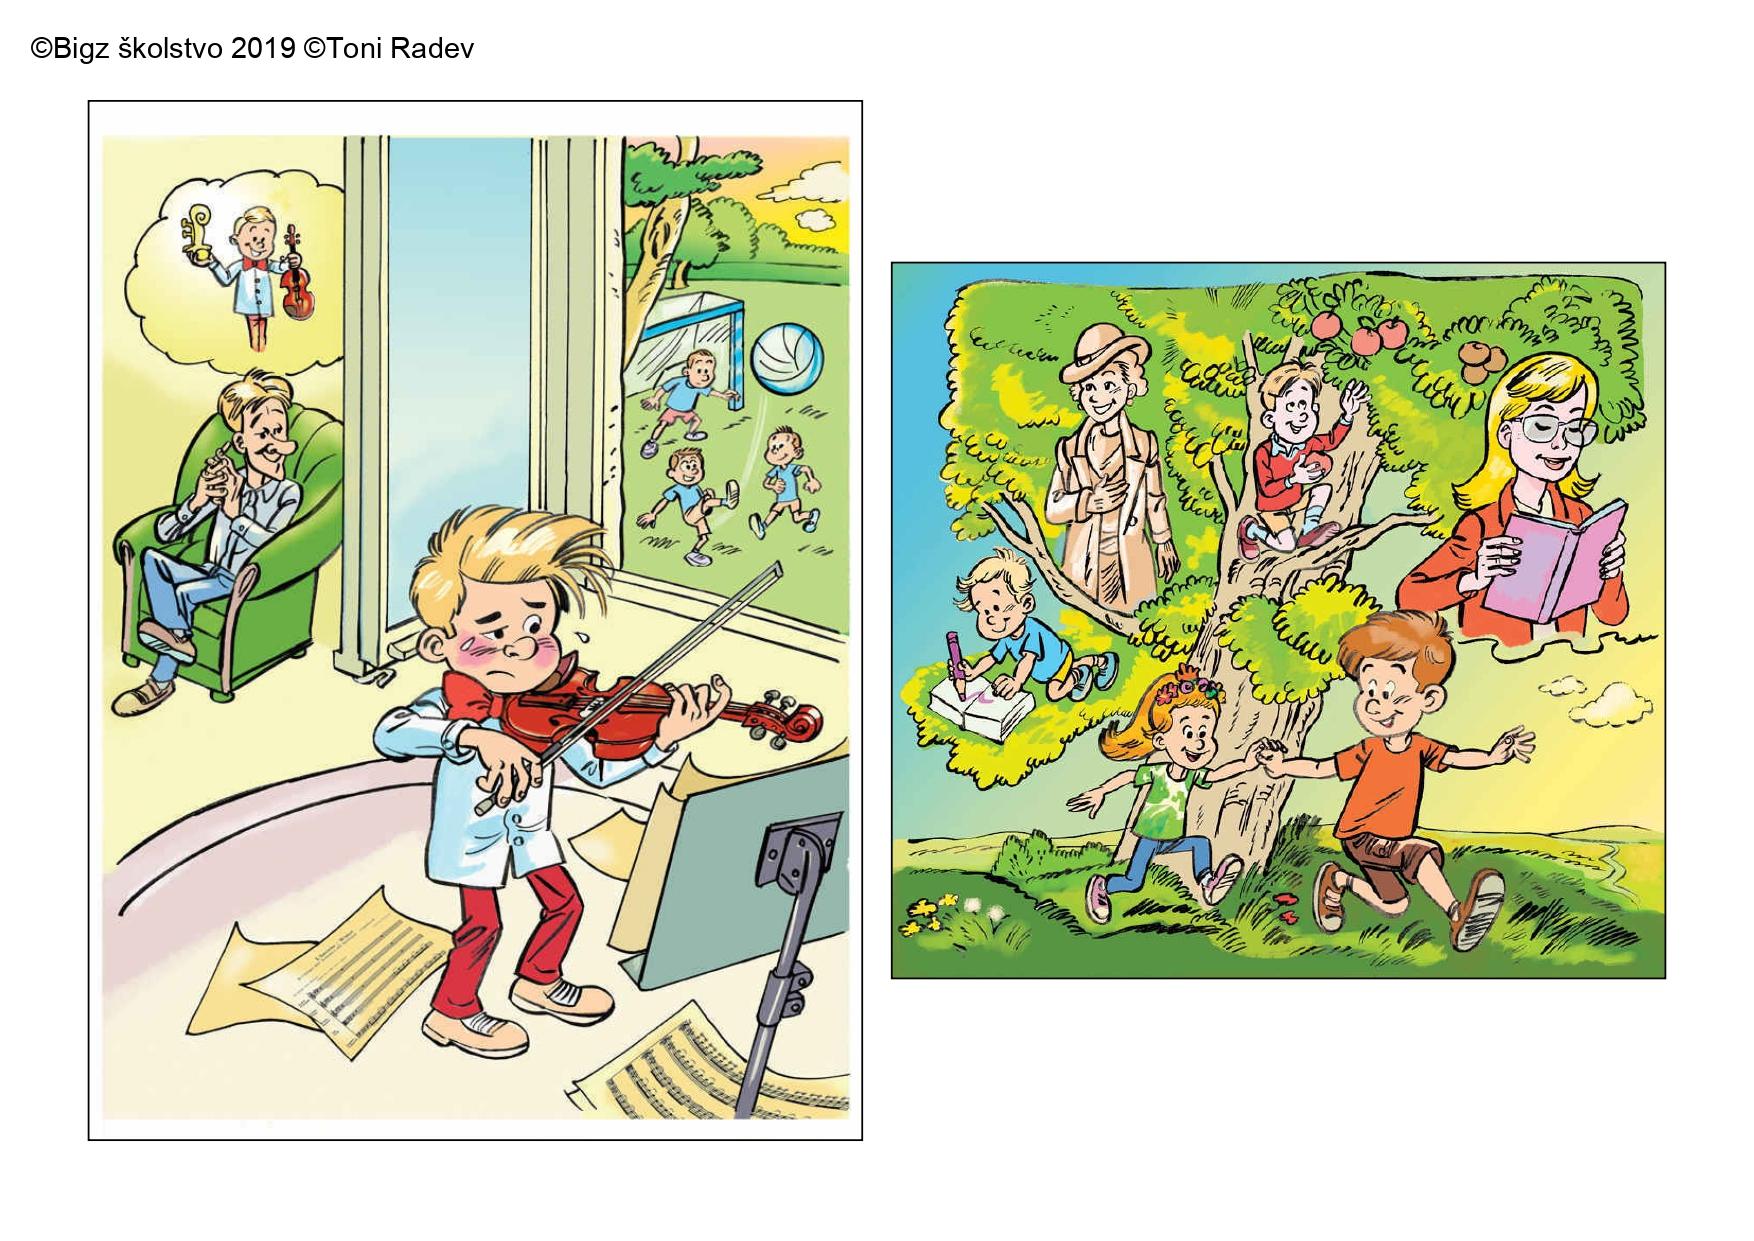 Toni Radev Bigz illustration page 0001